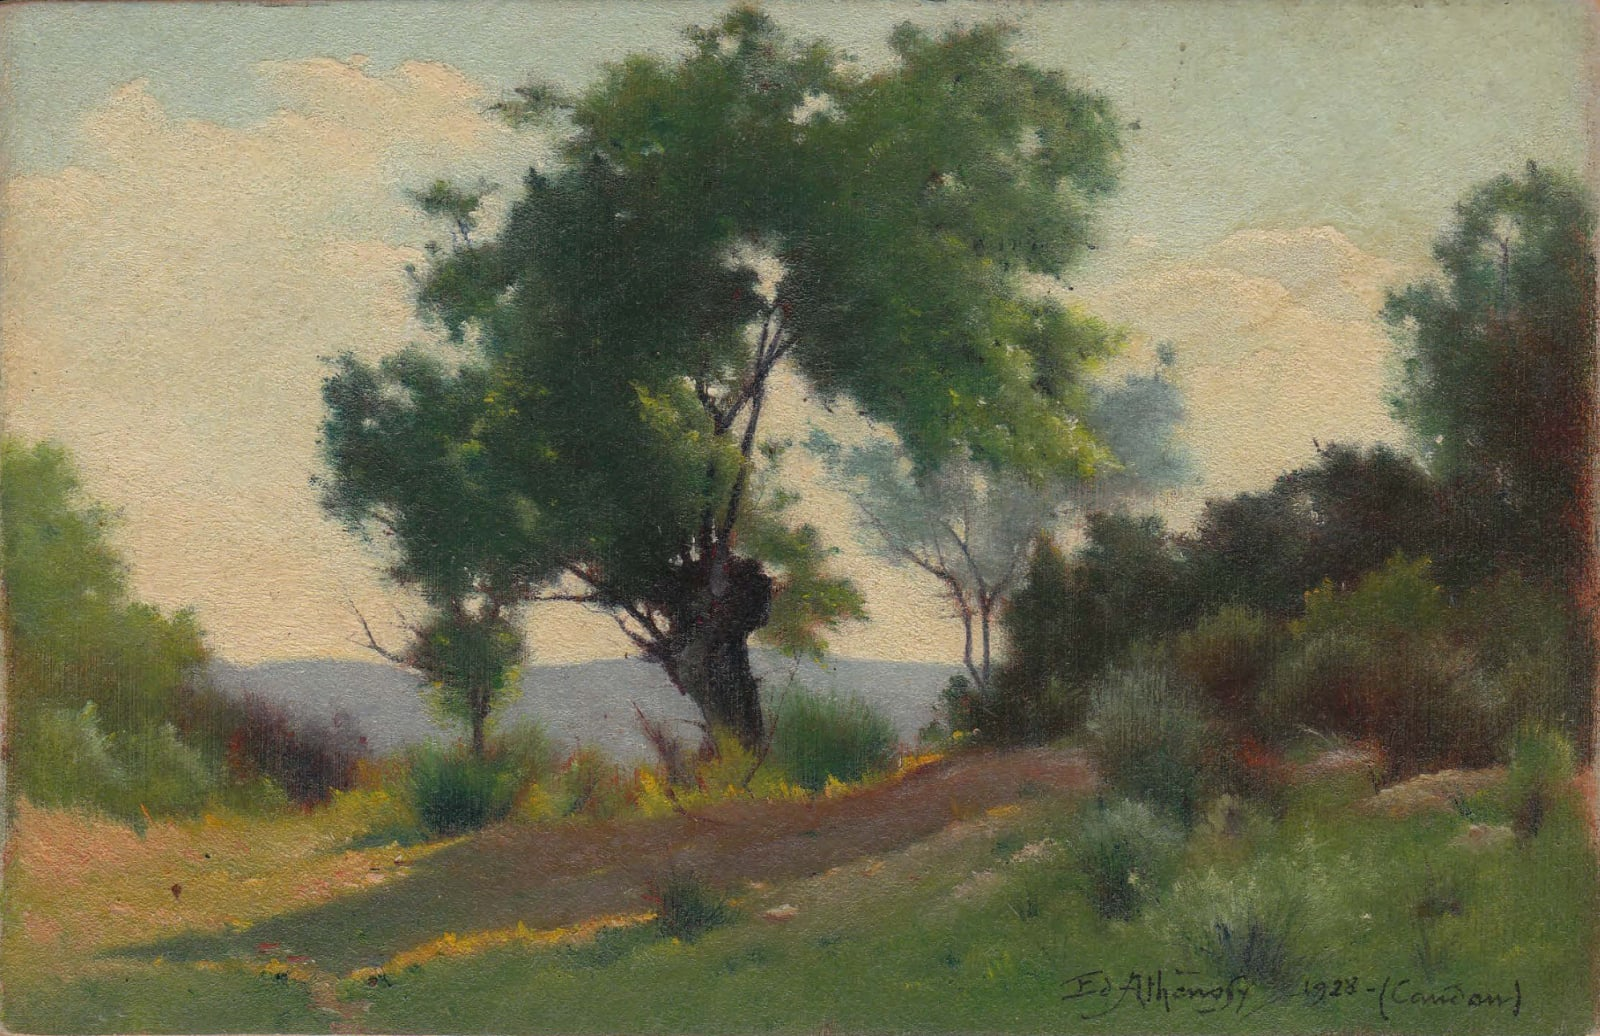 EDOUARD ATHÉNOSY, A little Corot, 1928